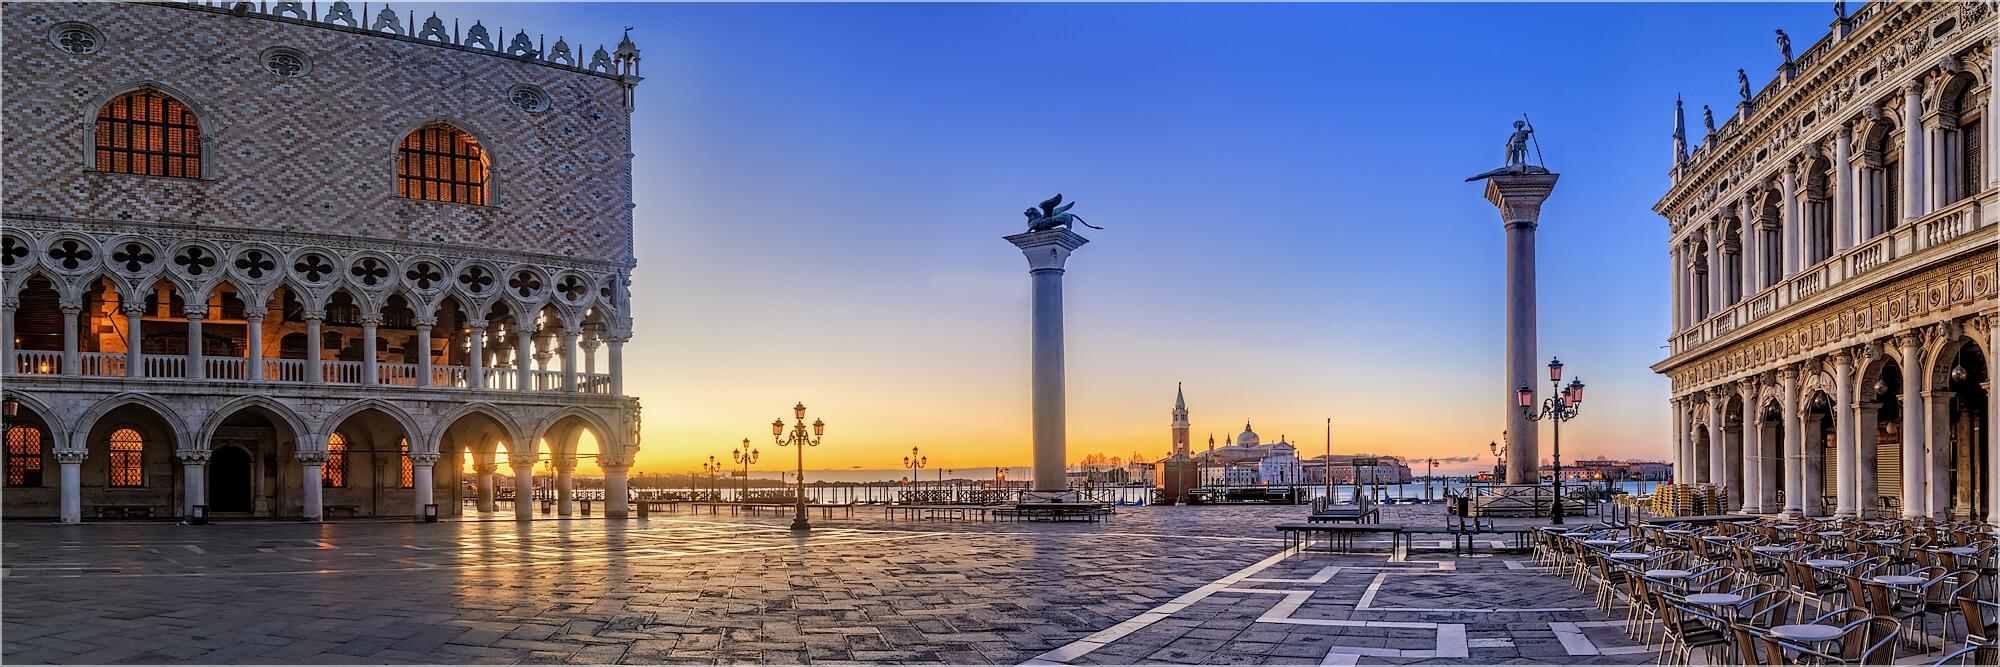 Panoramafoto Sonnenaufgang San Marco Venedig Italien